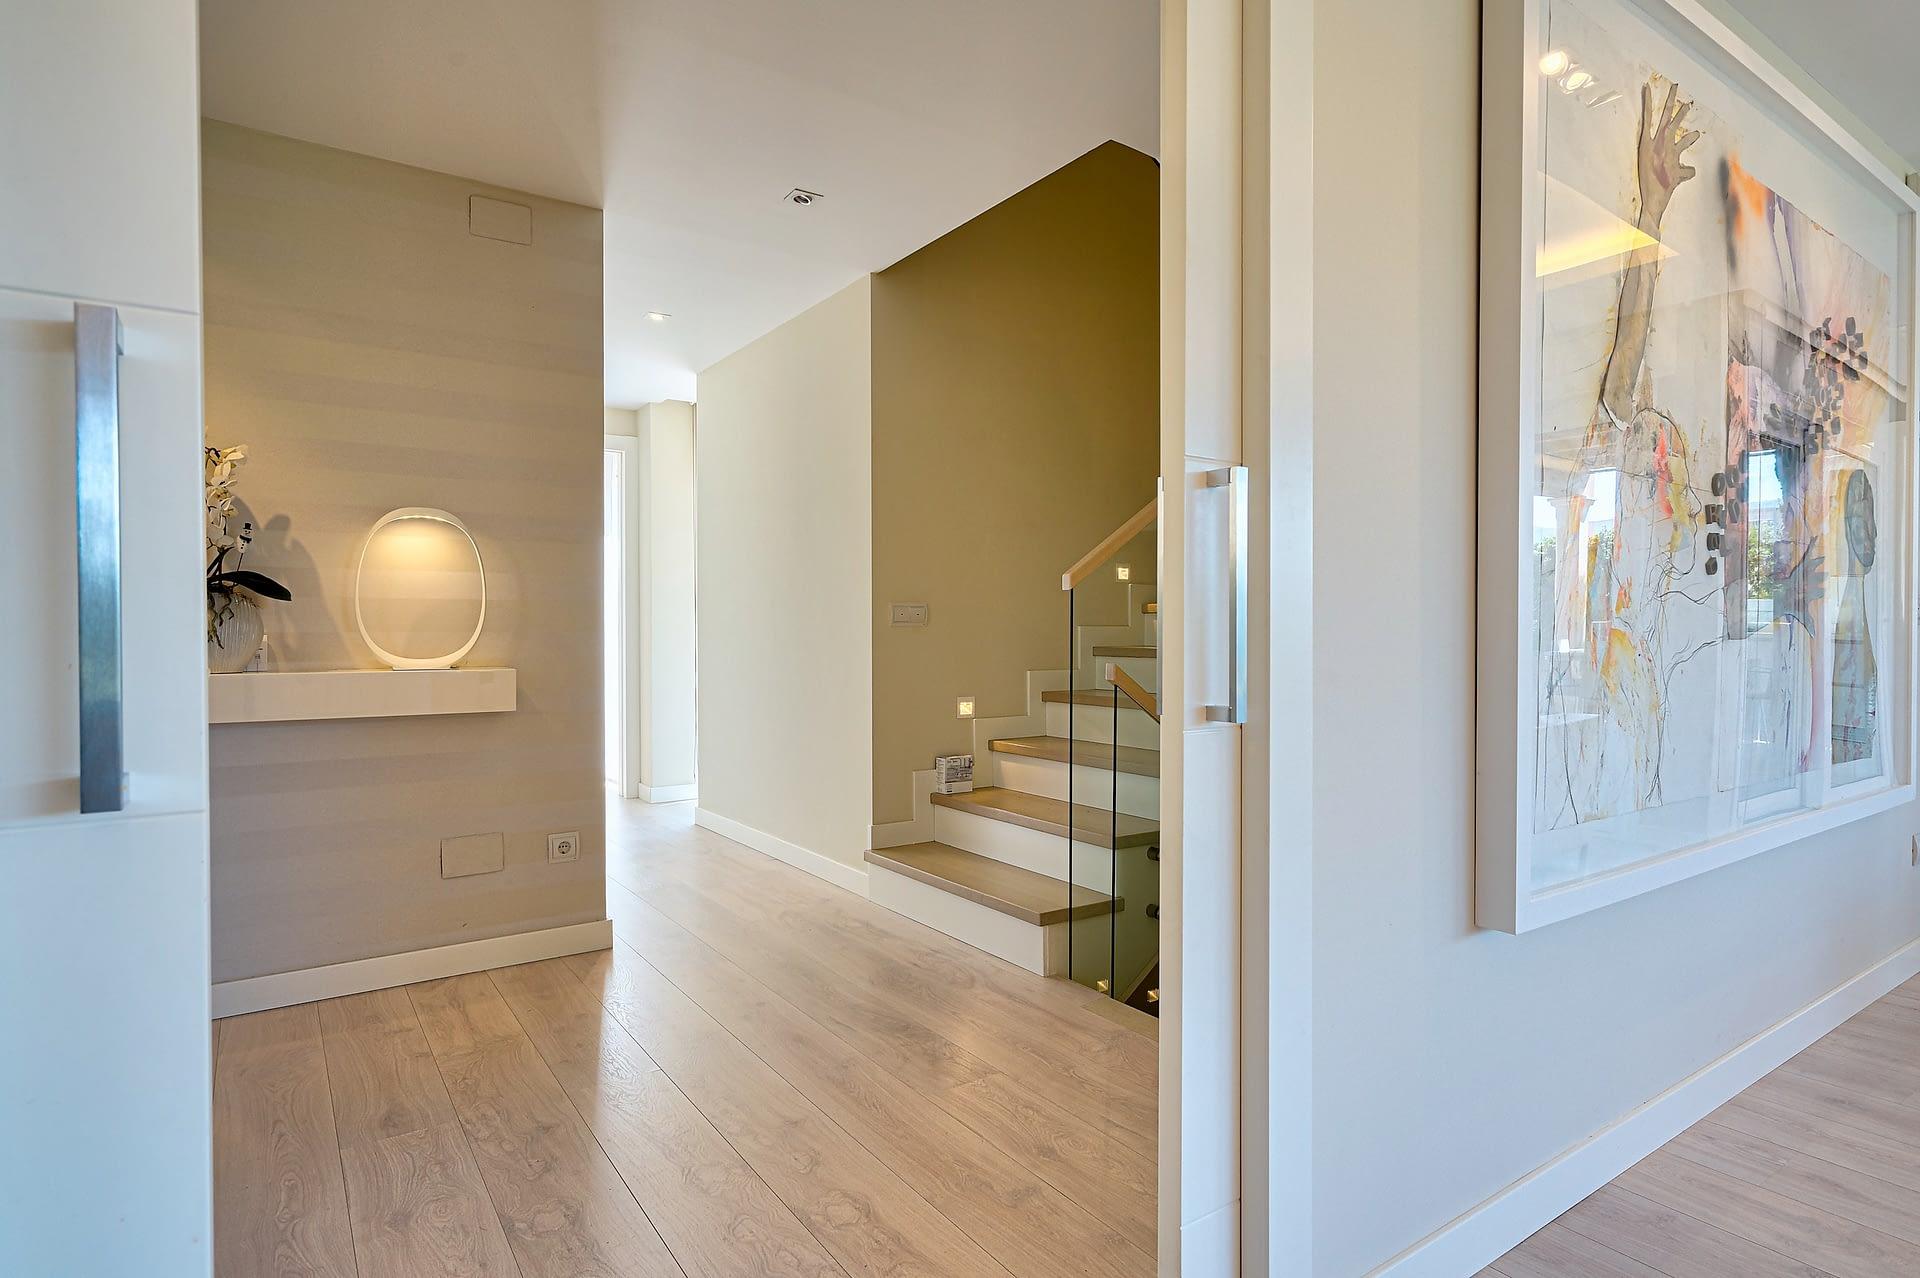 Pierluigi Cavarra - fotografo de Inmobiliaria - real estate photography costa blanca - ejemplo16